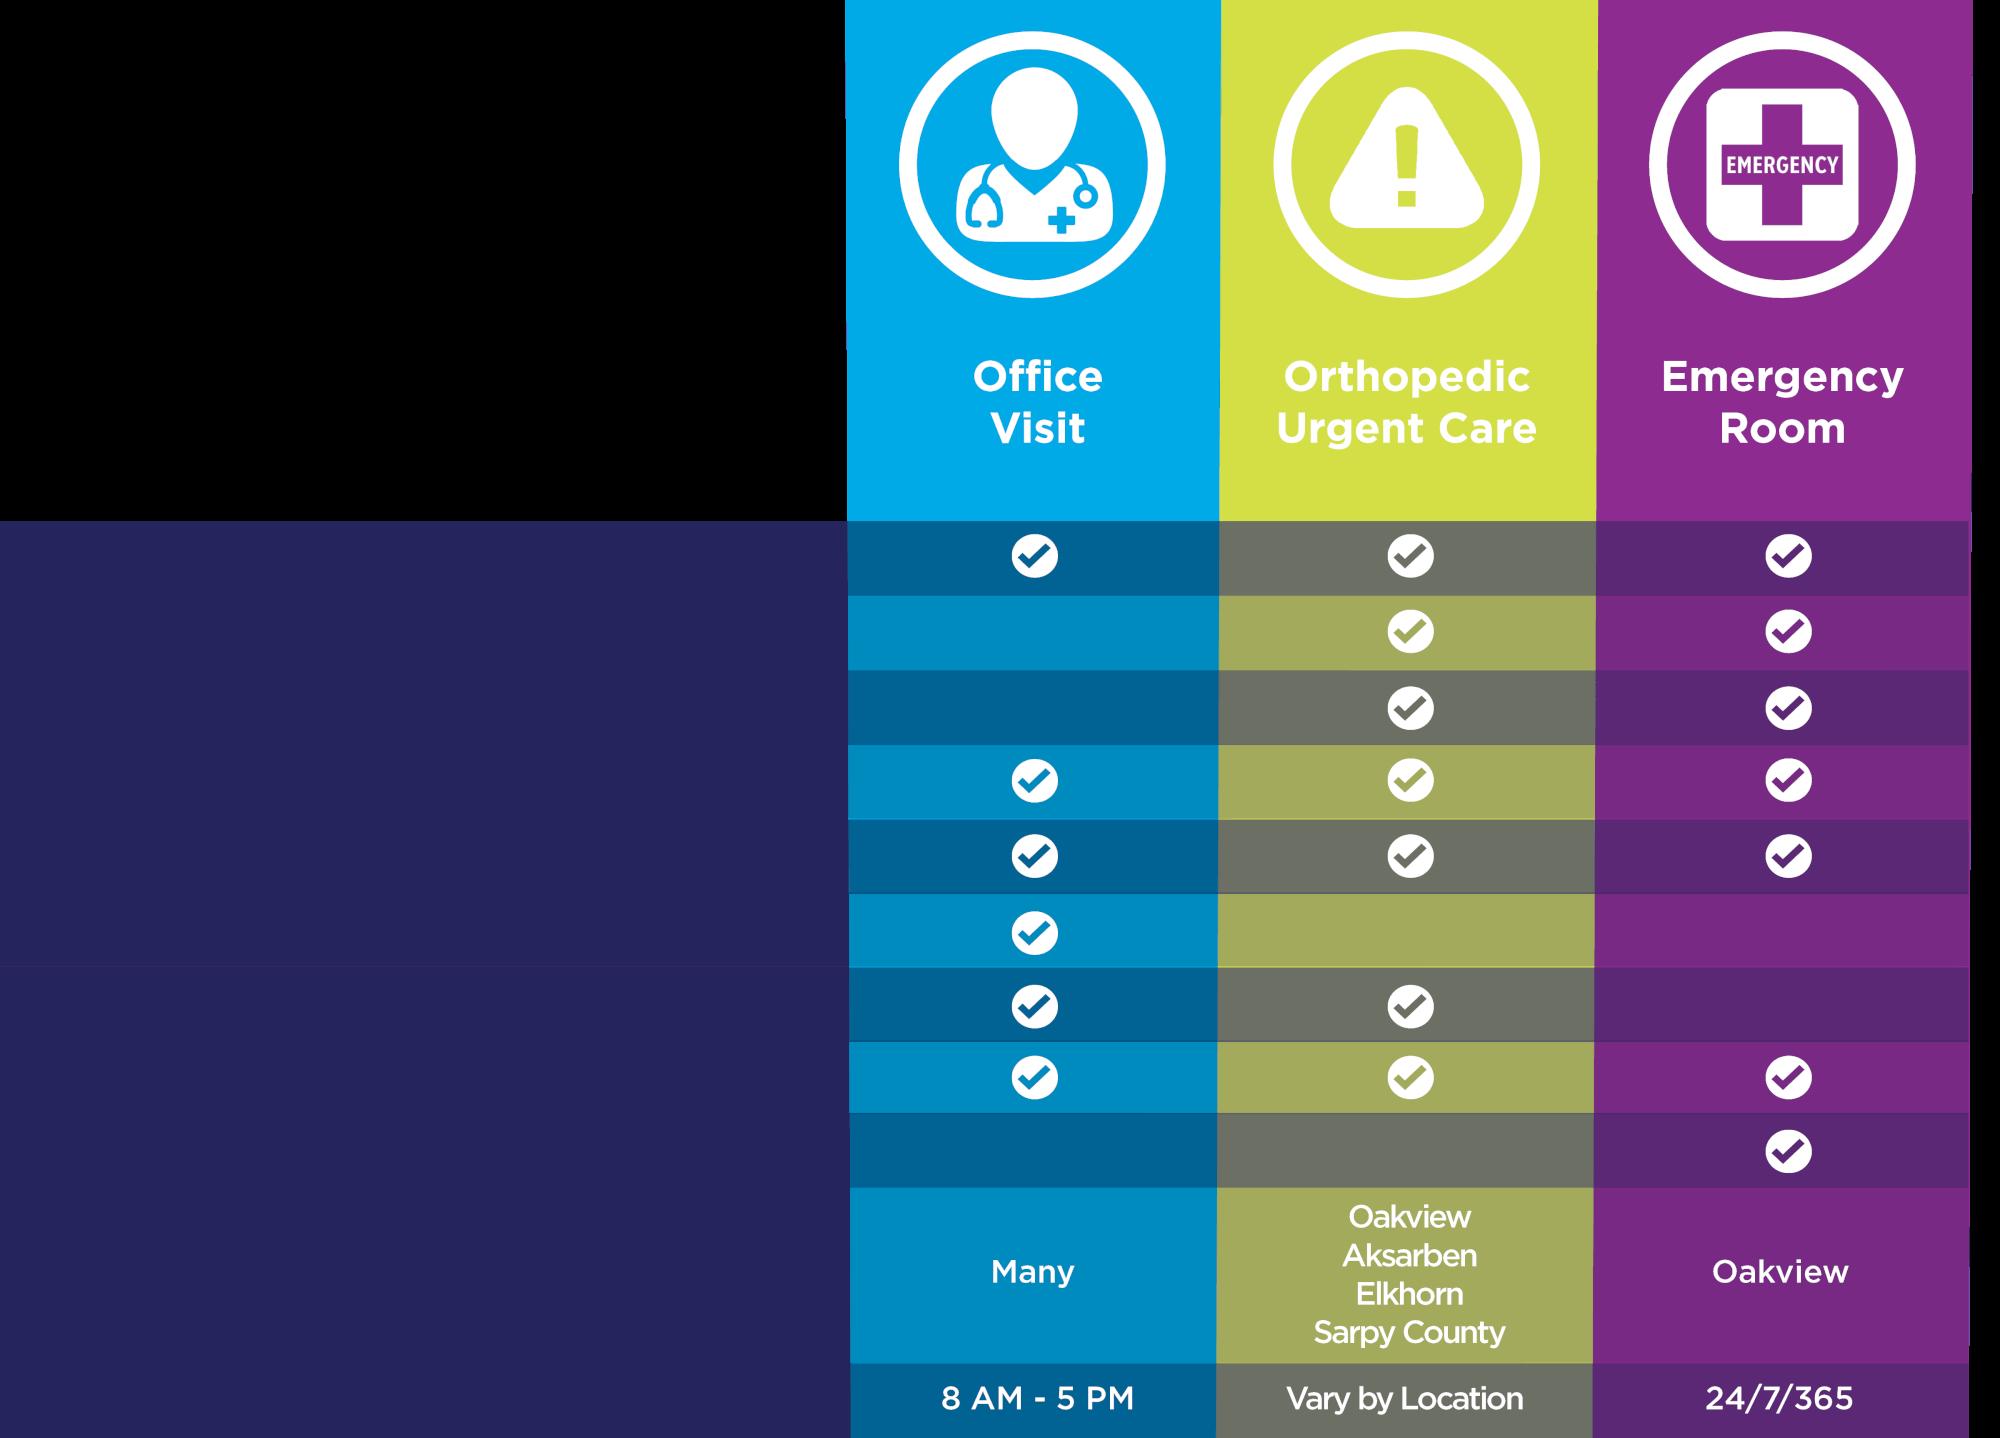 Office Visits vs. Urgent Care vs. Emergency Care